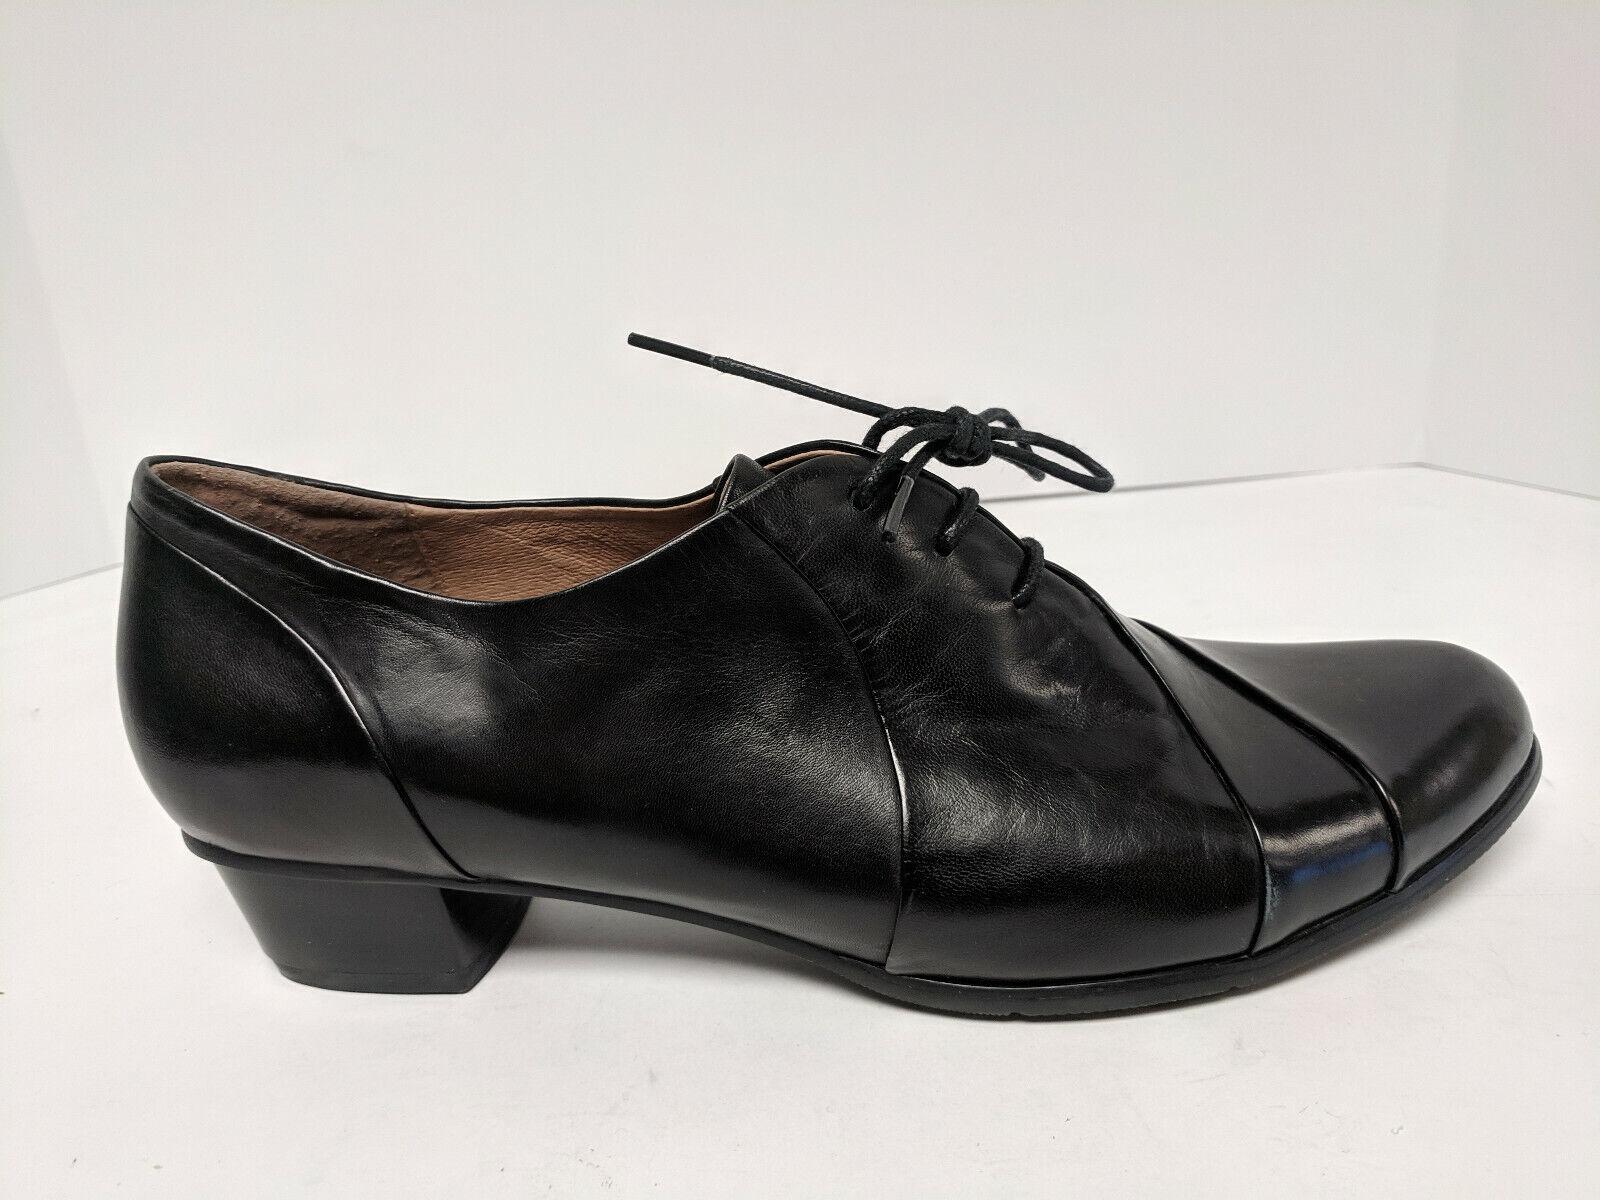 Spring Step Elvera Leather Oxford, Black, Womens 42 EU (US 10.5-11)